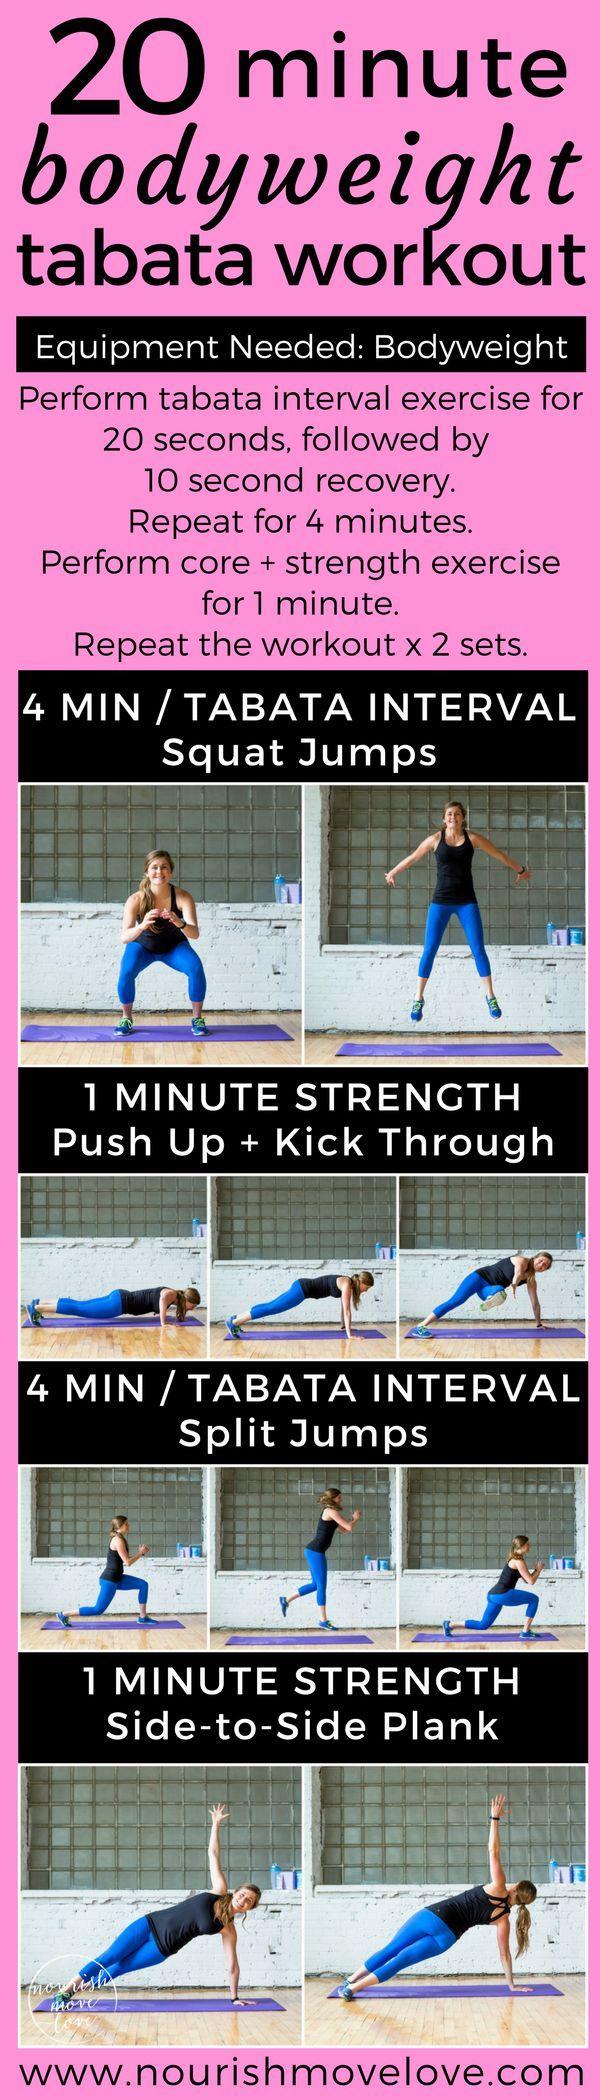 20-Minute Bodyweight Tabata Workout | bodyweight workout | tabata workouts | 20 minute workout | at...